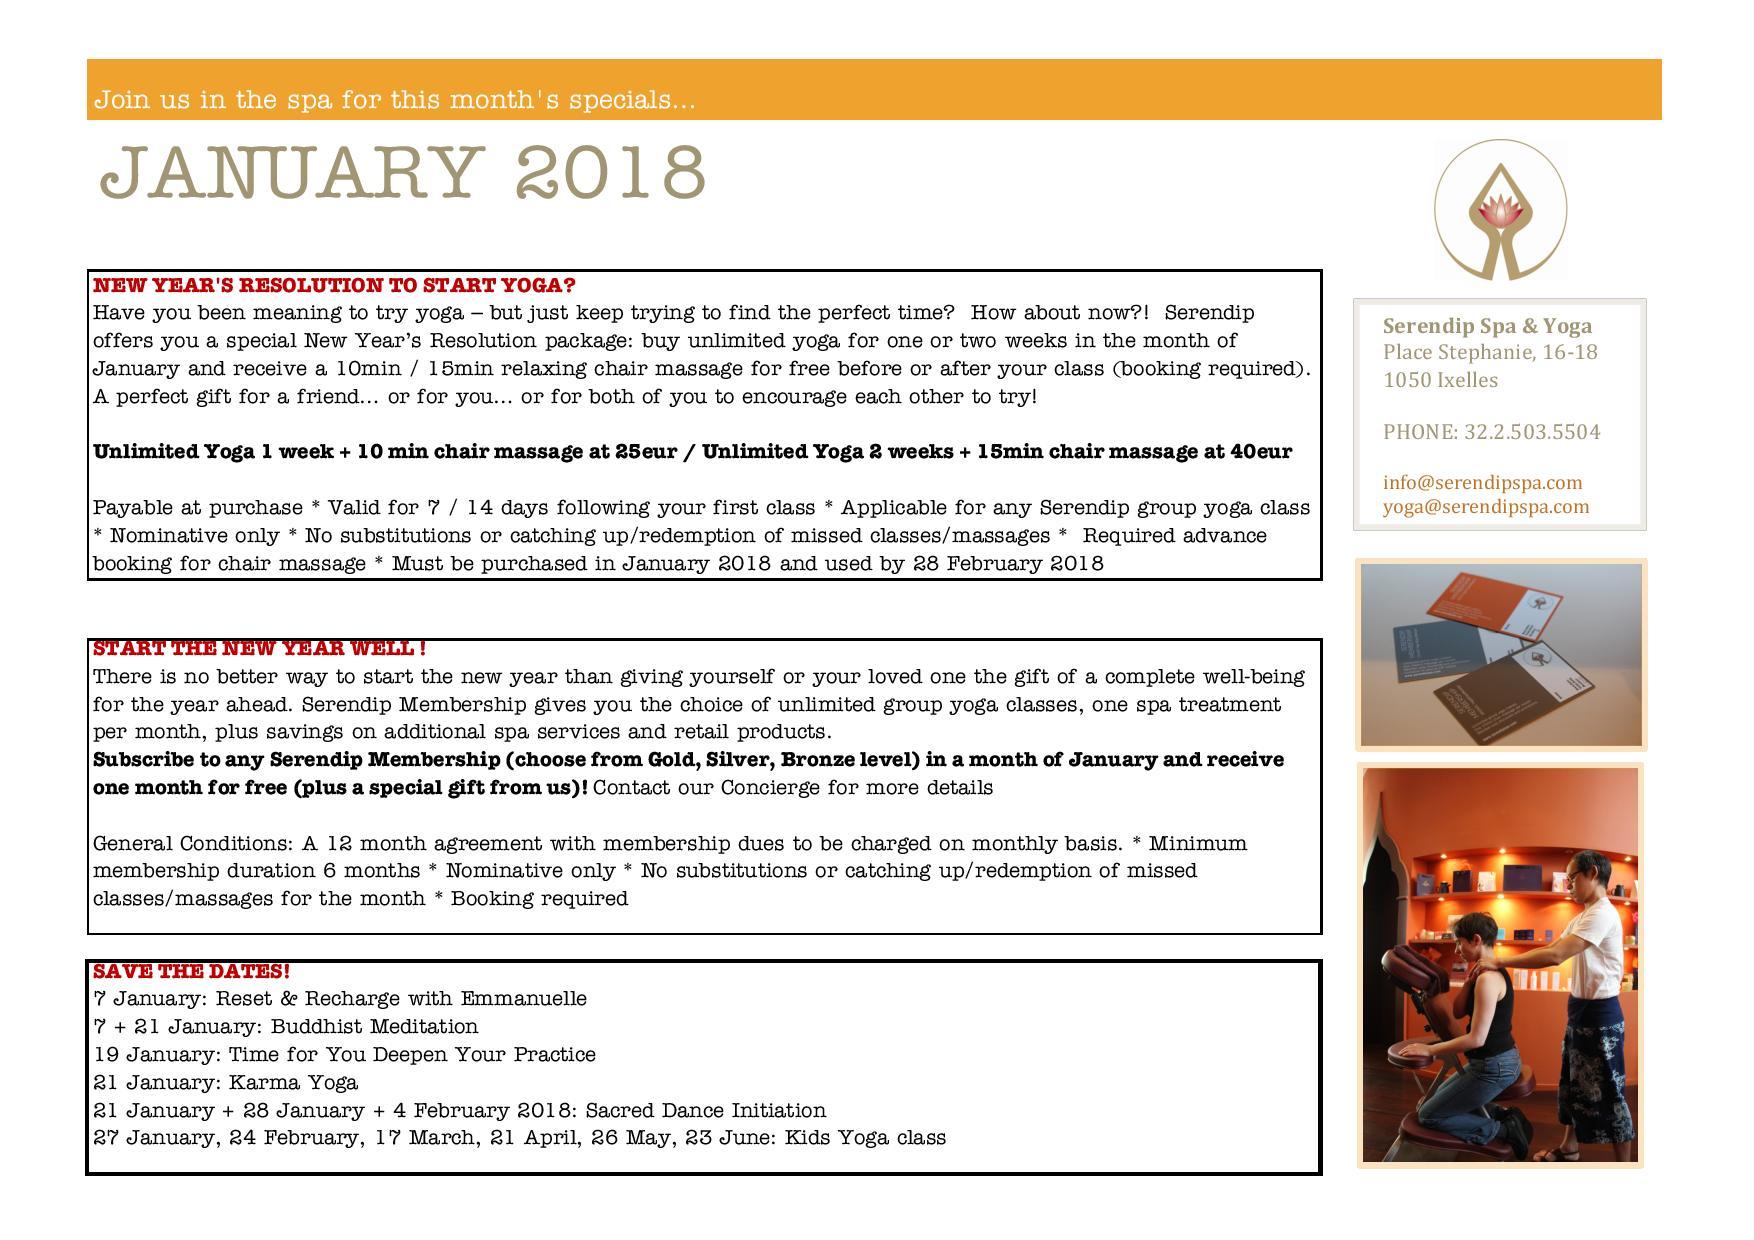 serendip spa and yoga calendar 2018_January A4 BACK-page-001.jpg